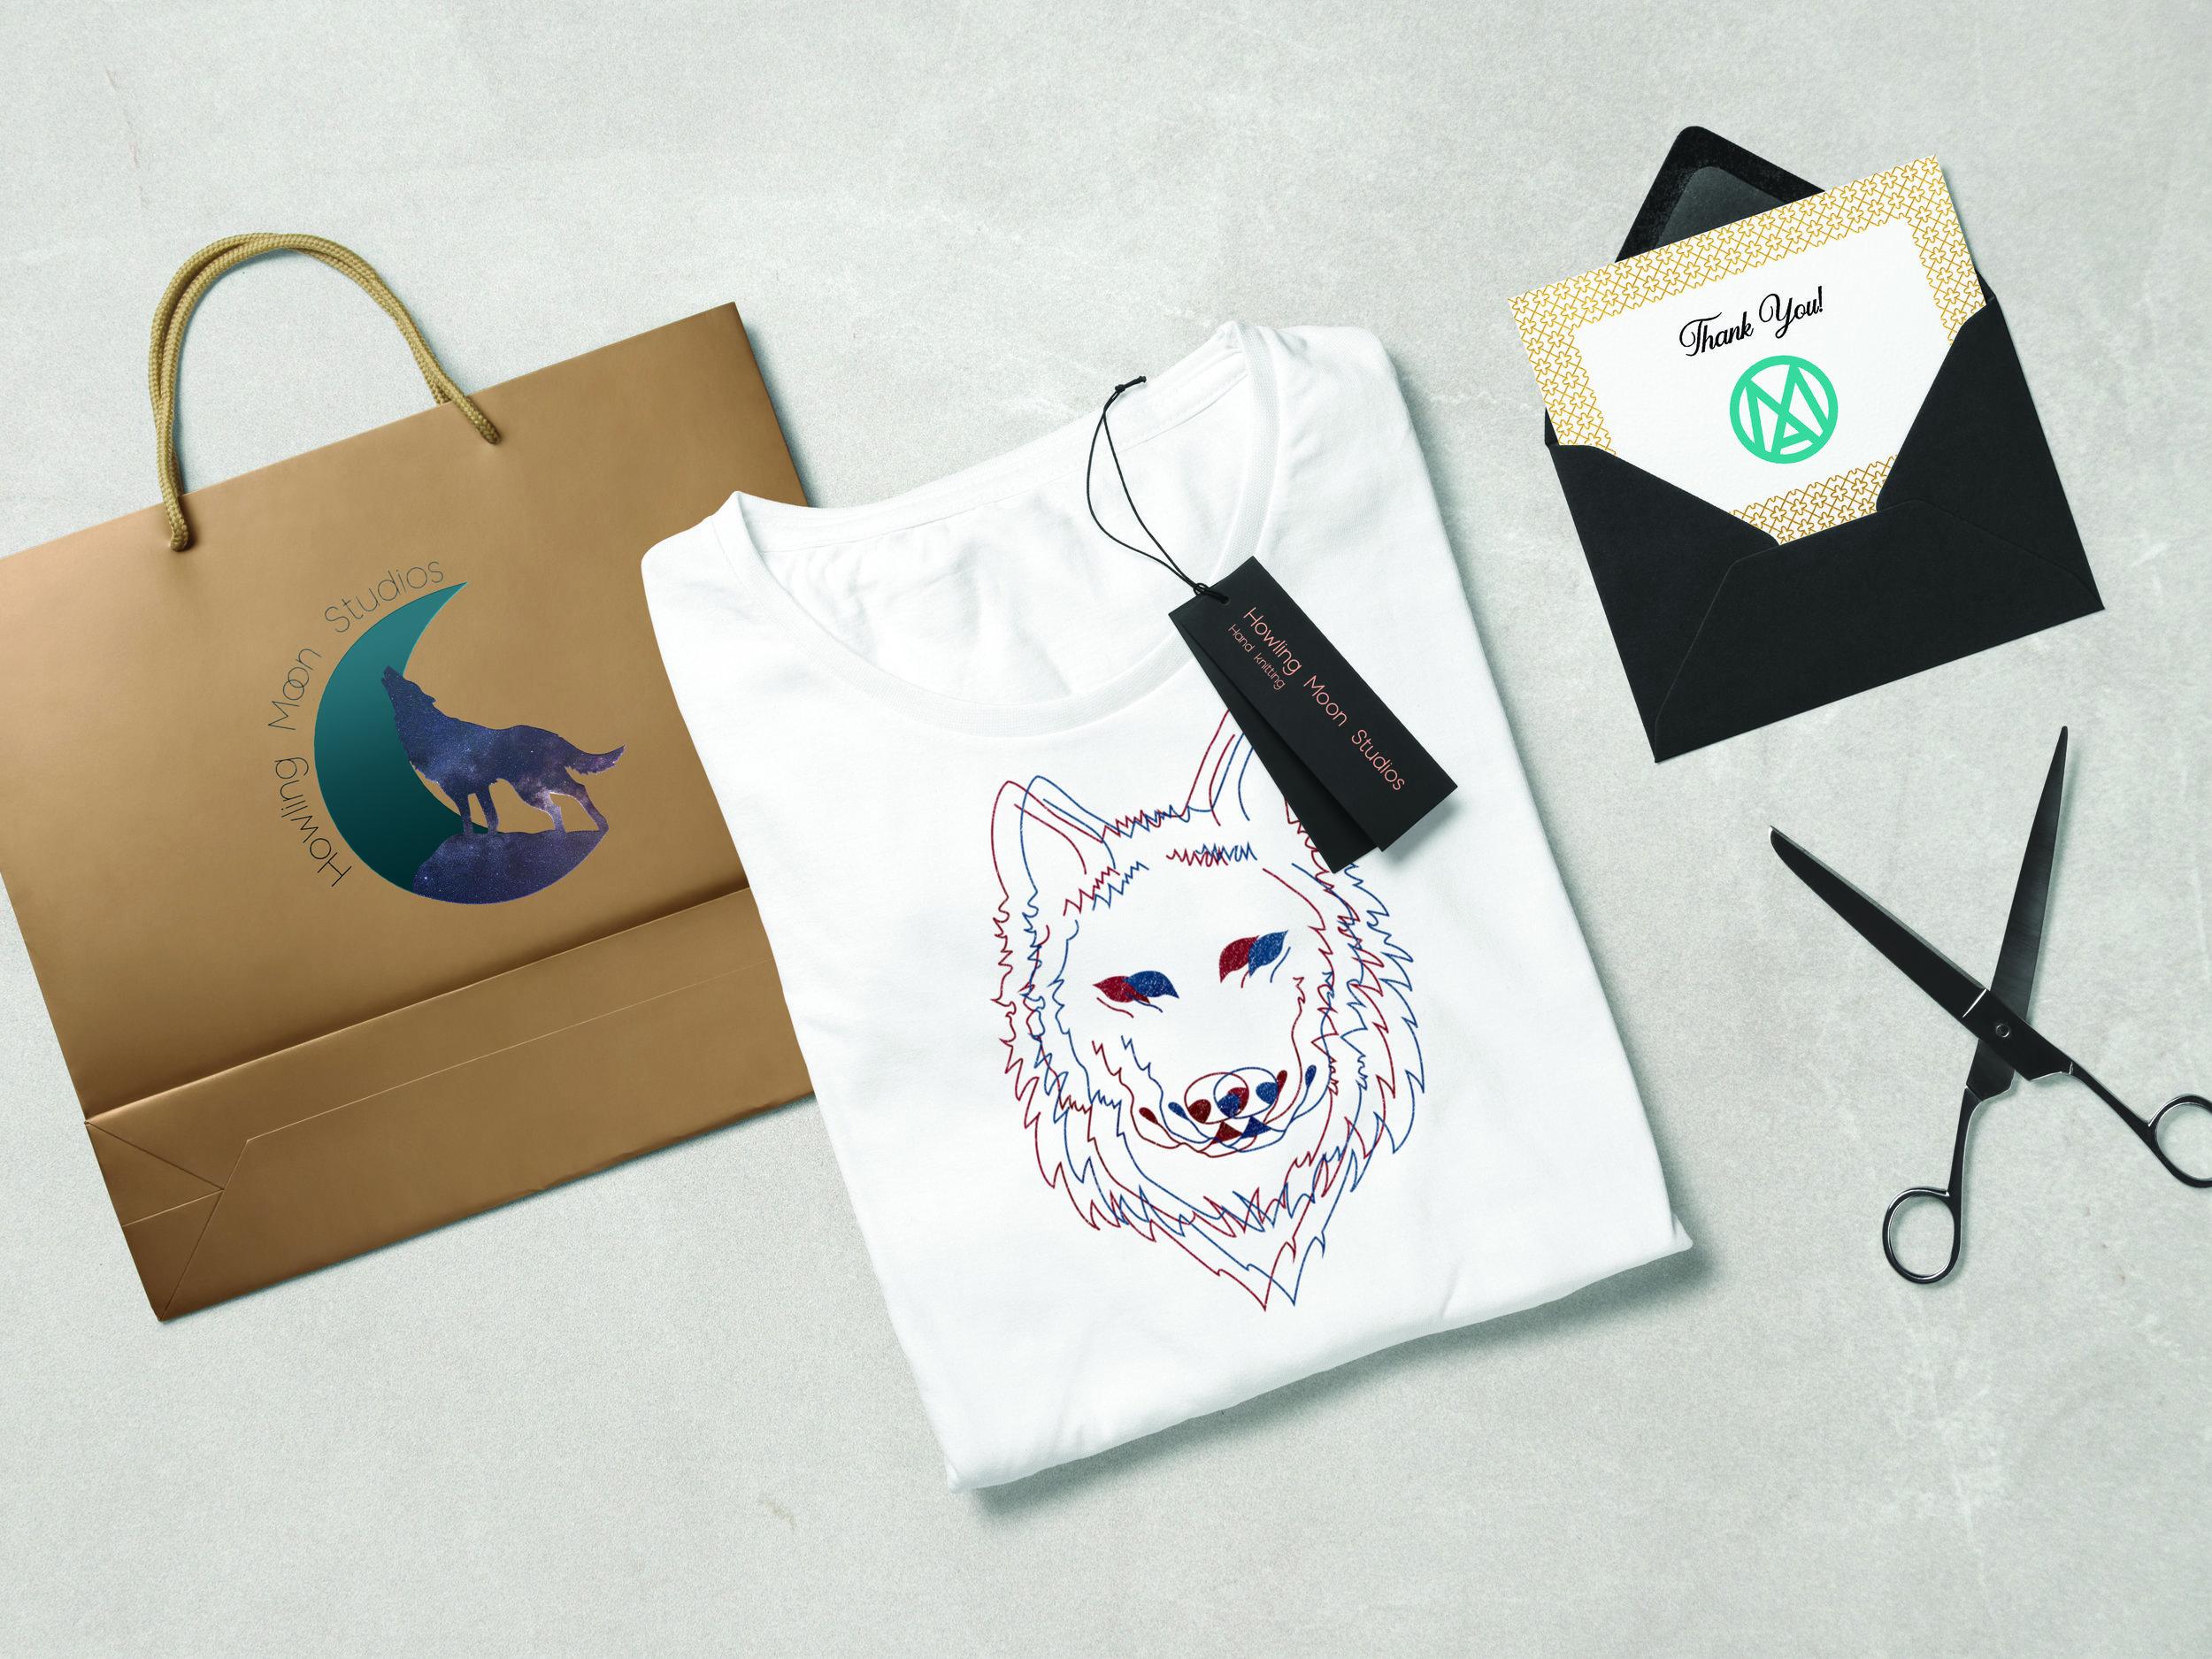 Howling Moon Studios Shirt and Bag Design